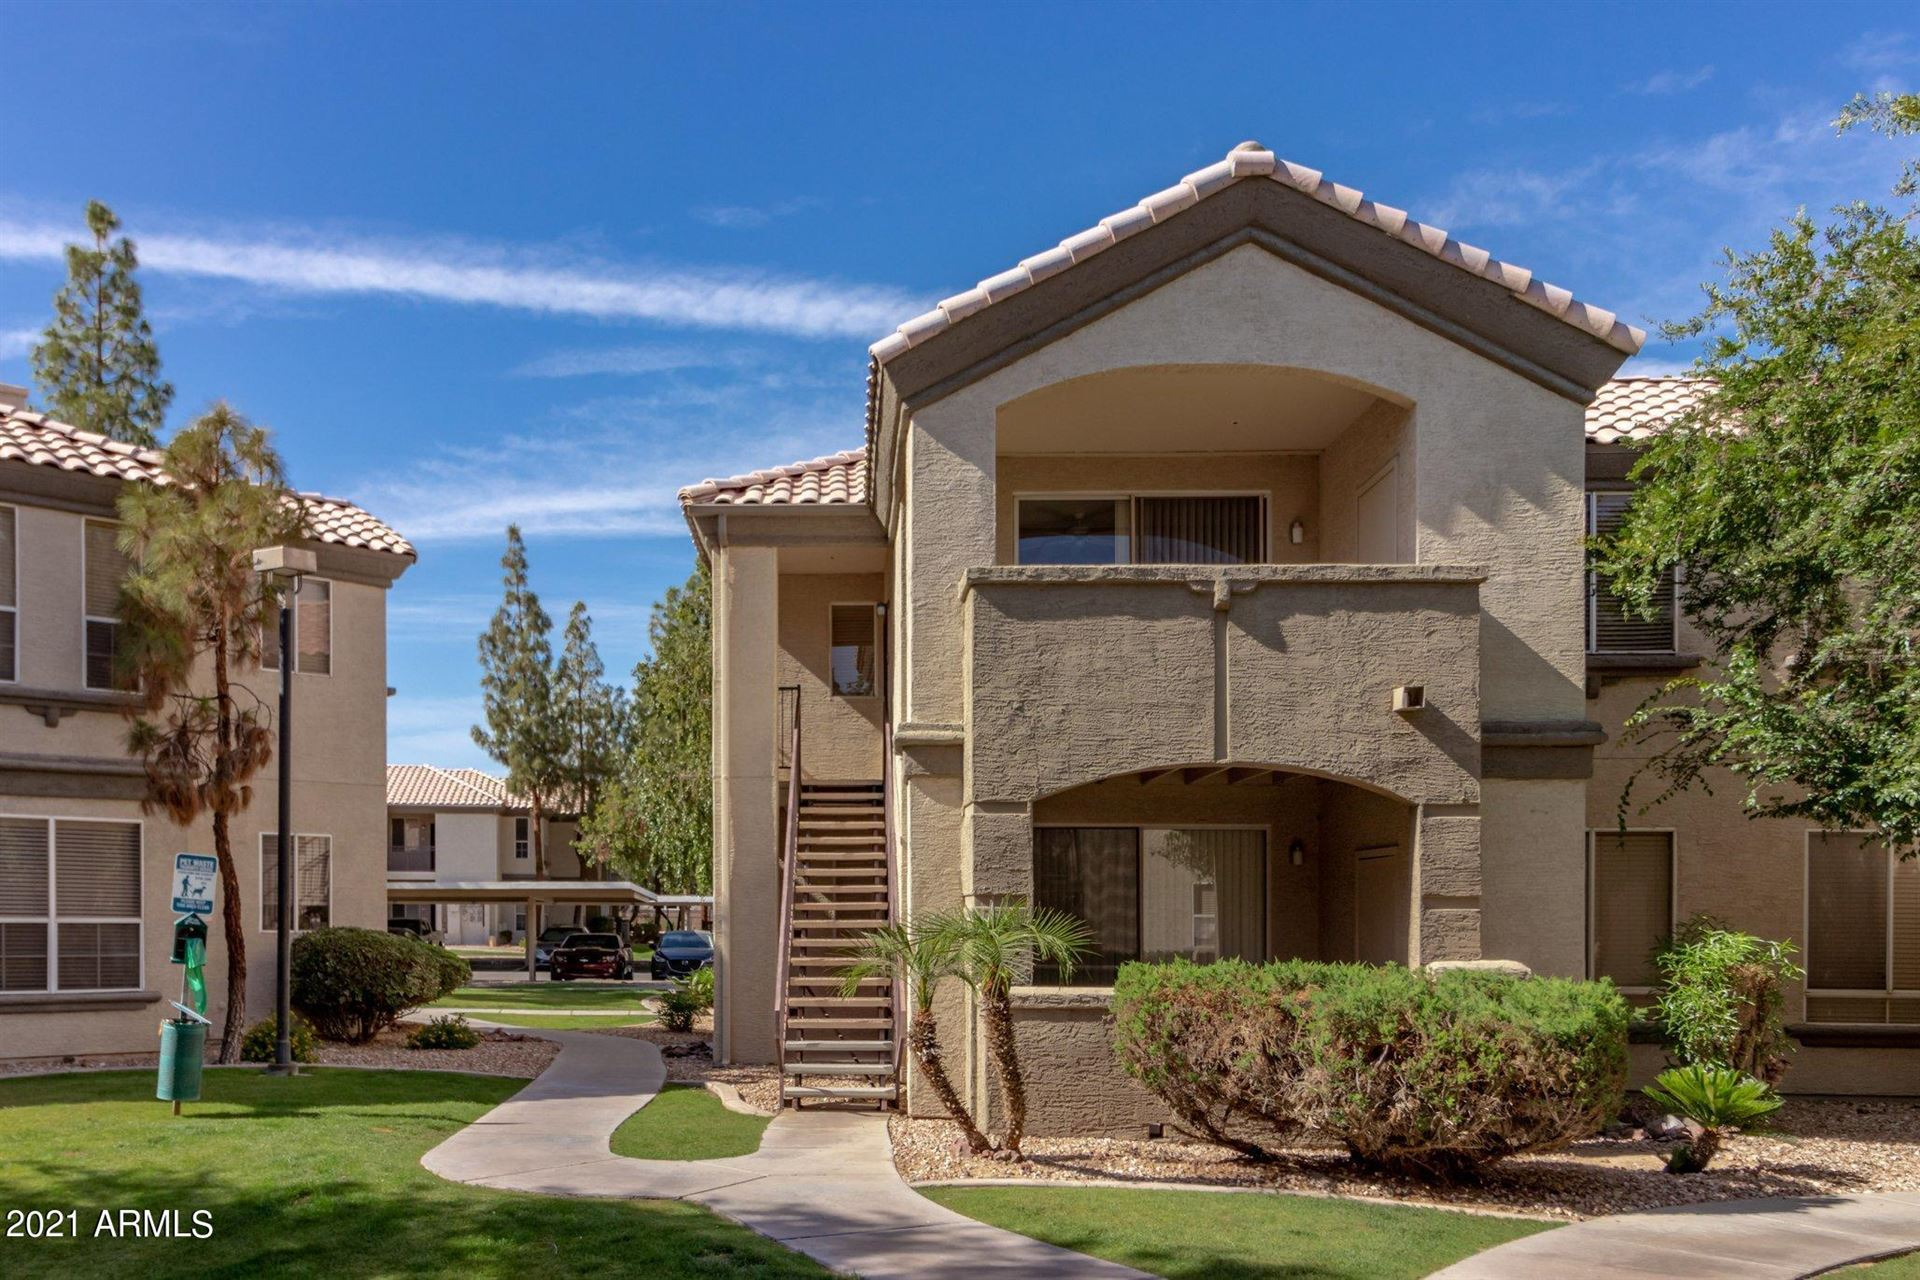 1100 N PRIEST Drive #2109, Chandler, AZ 85226 - MLS#: 6233175